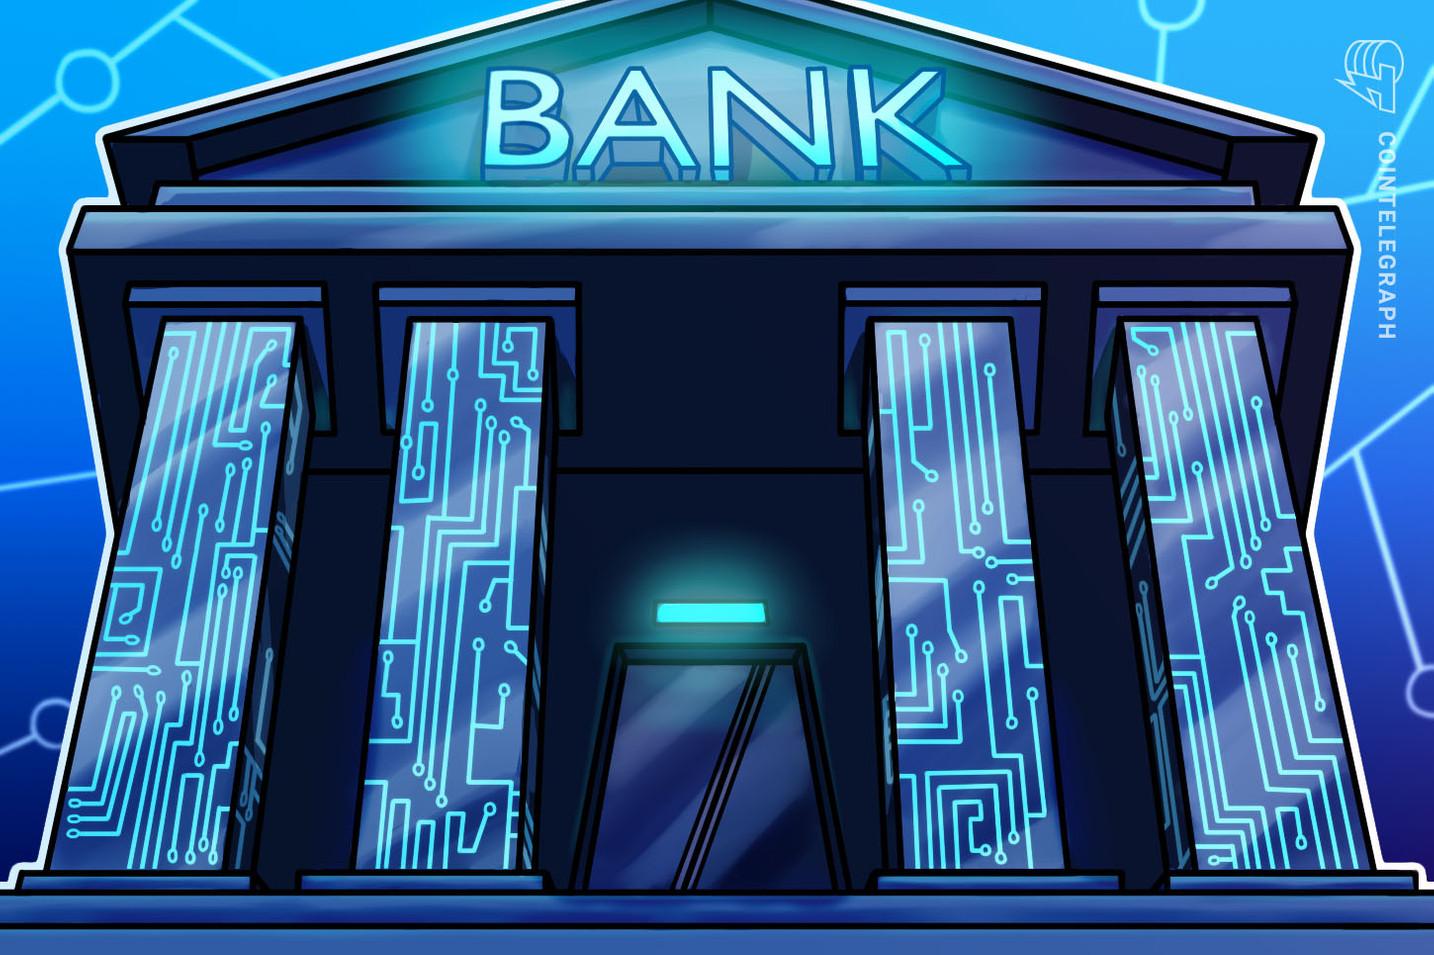 Zentralbank von Uganda warnt vor riskanten dezentralen Kryptowährungen